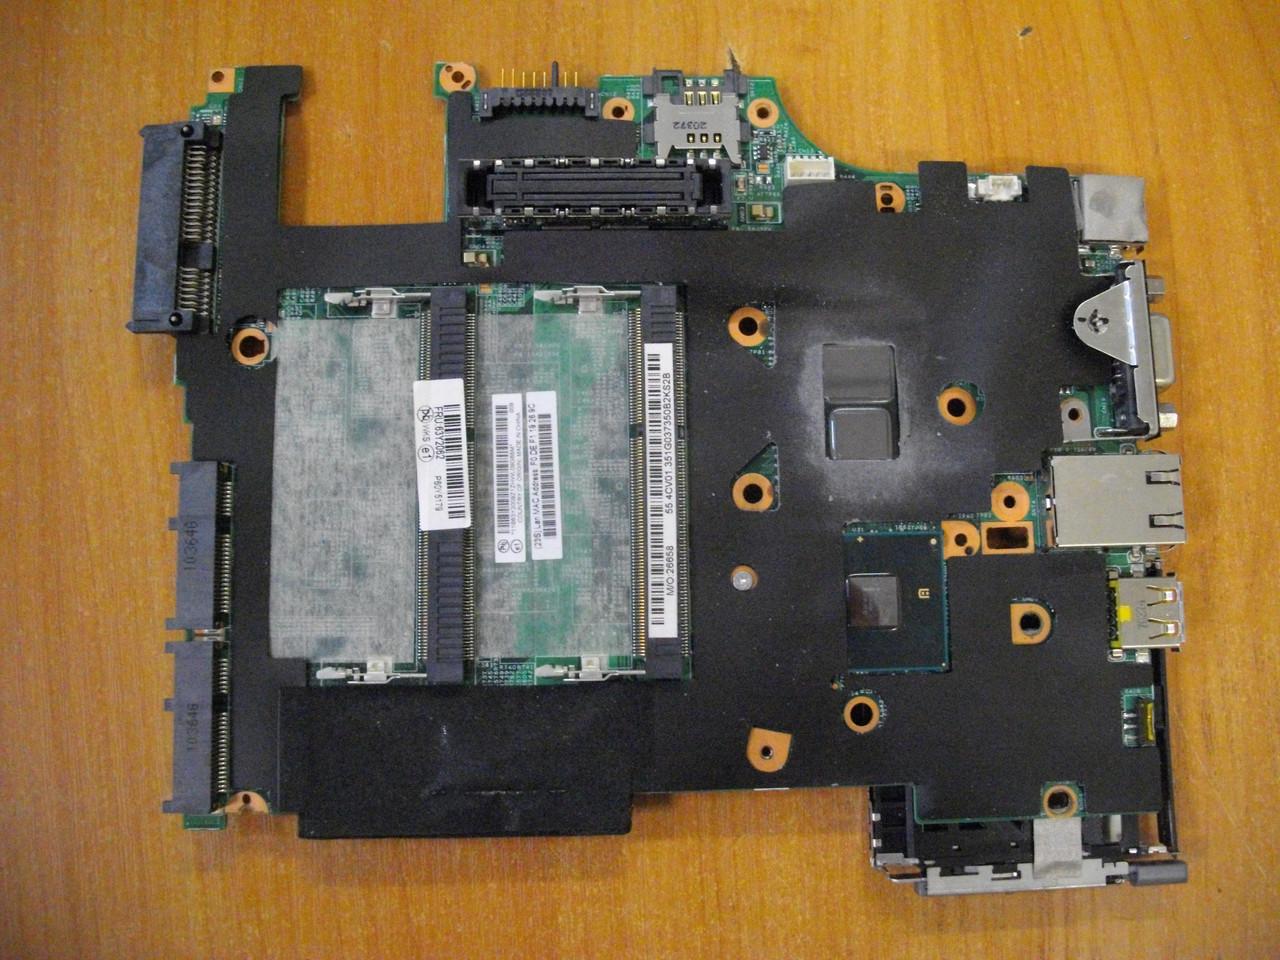 Материнская плата 63Y2026 48.4CV13.021 i5-520M PLBU4 от ноутбука Lenovo X201.